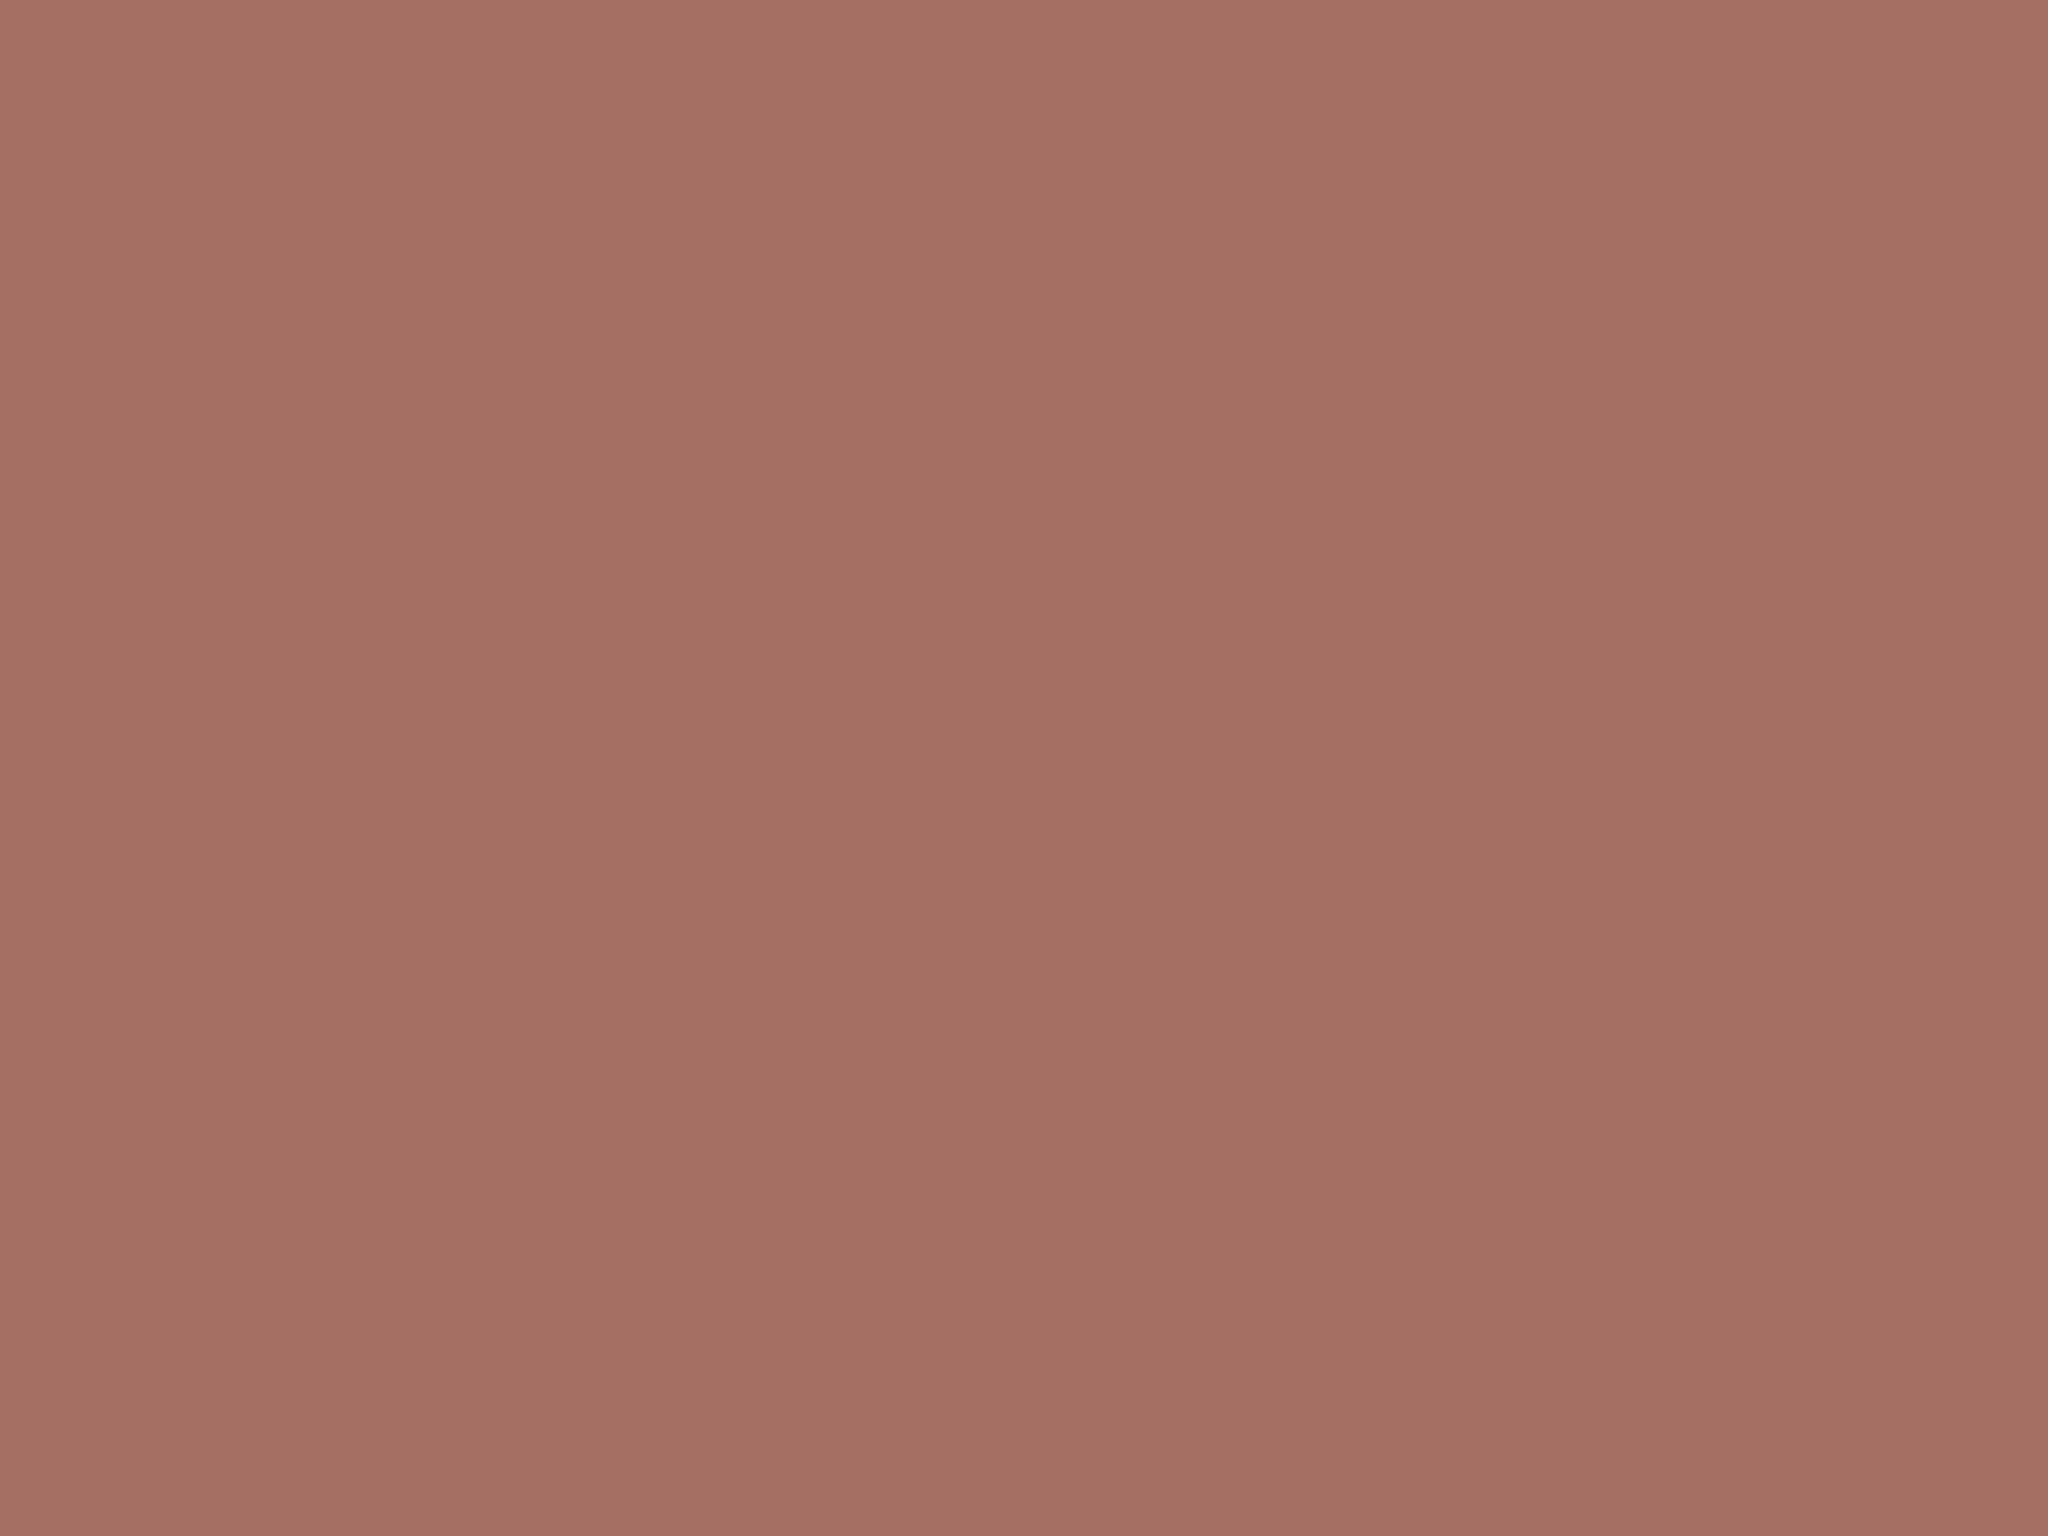 2048x1536 Blast-off Bronze Solid Color Background